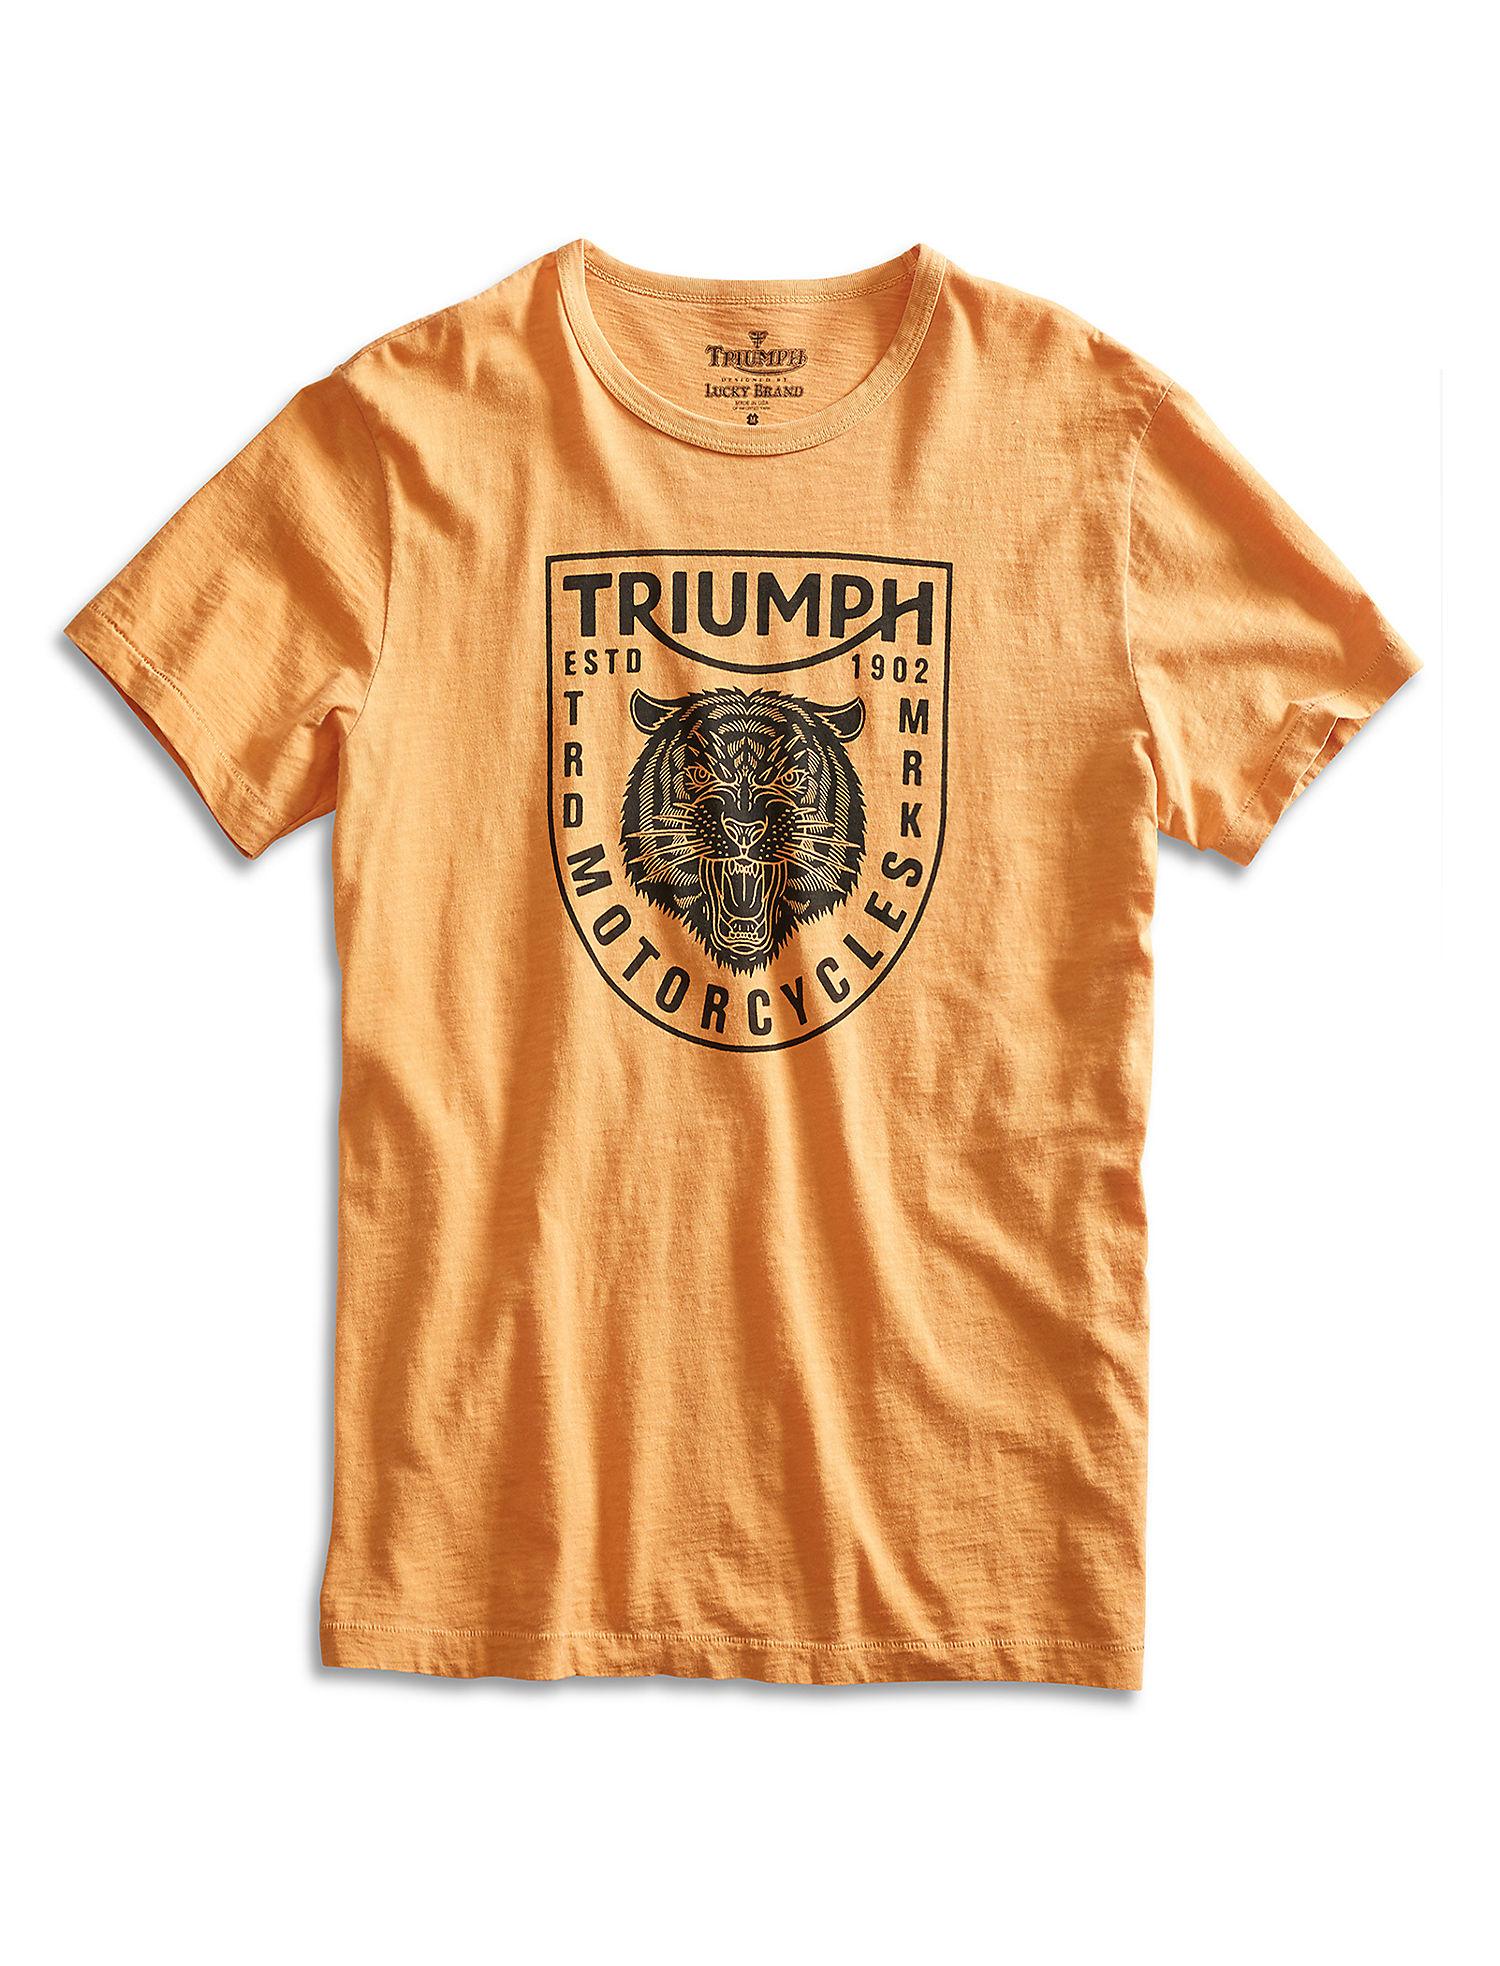 7ce1a27de Image is loading Lucky-Brand-Men-039-s-Triumph-Tiger-Head